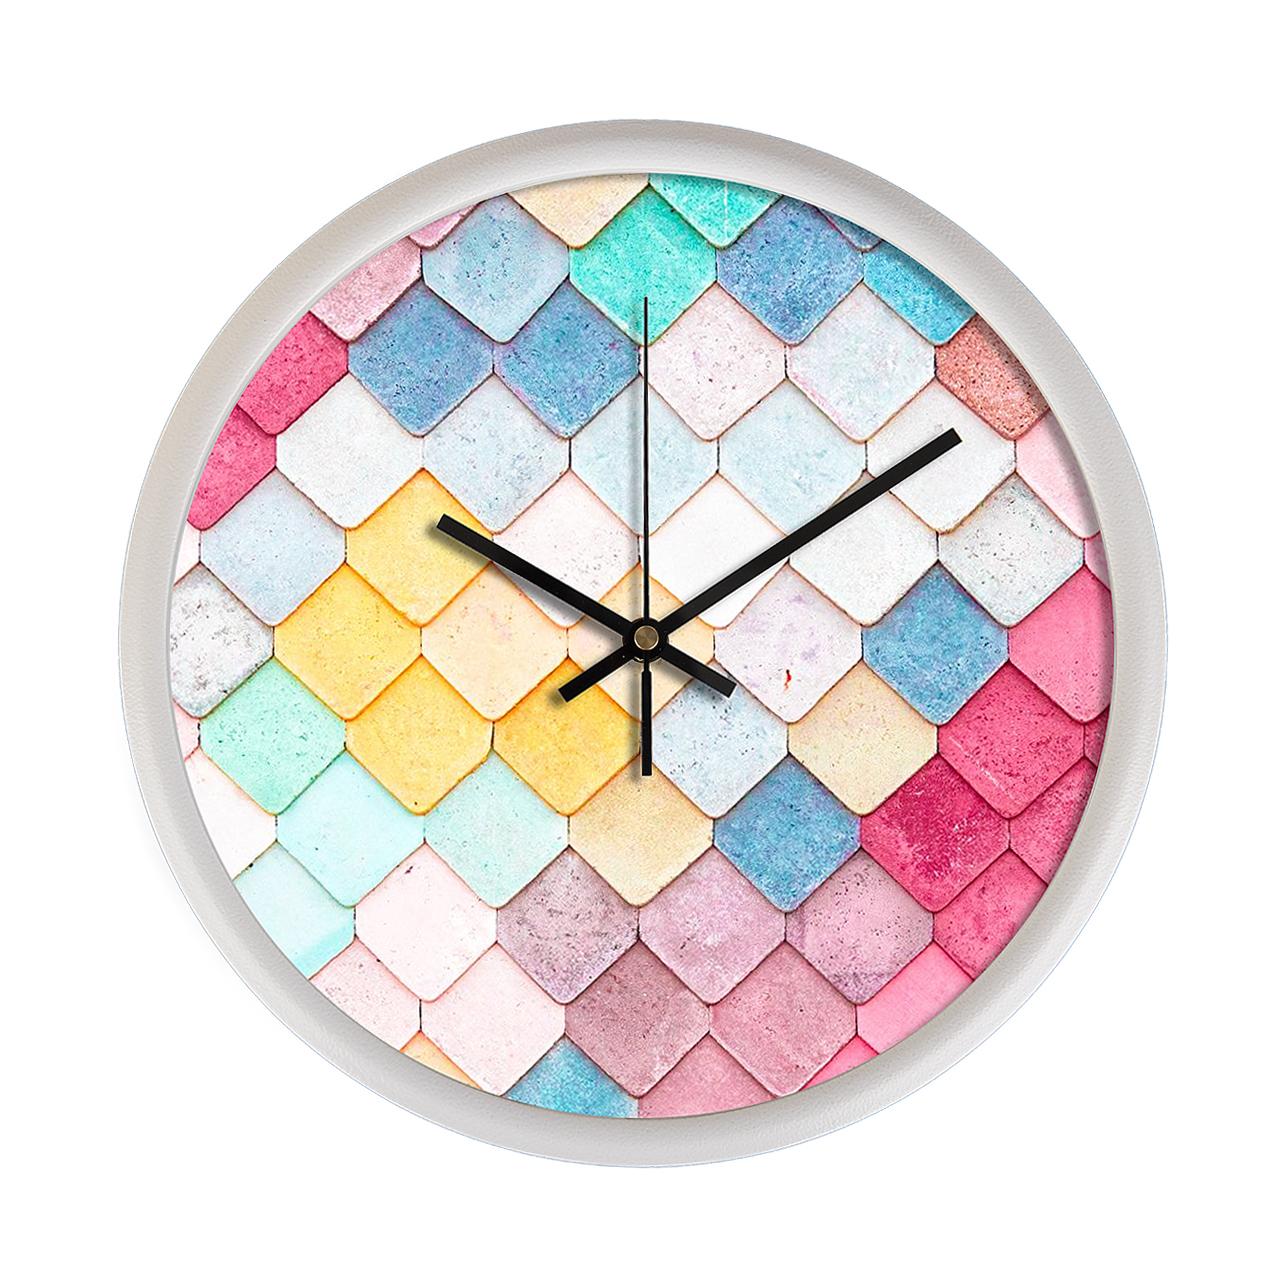 ساعت دیواری مینی مال لاکچری مدل 35Dio3_0119